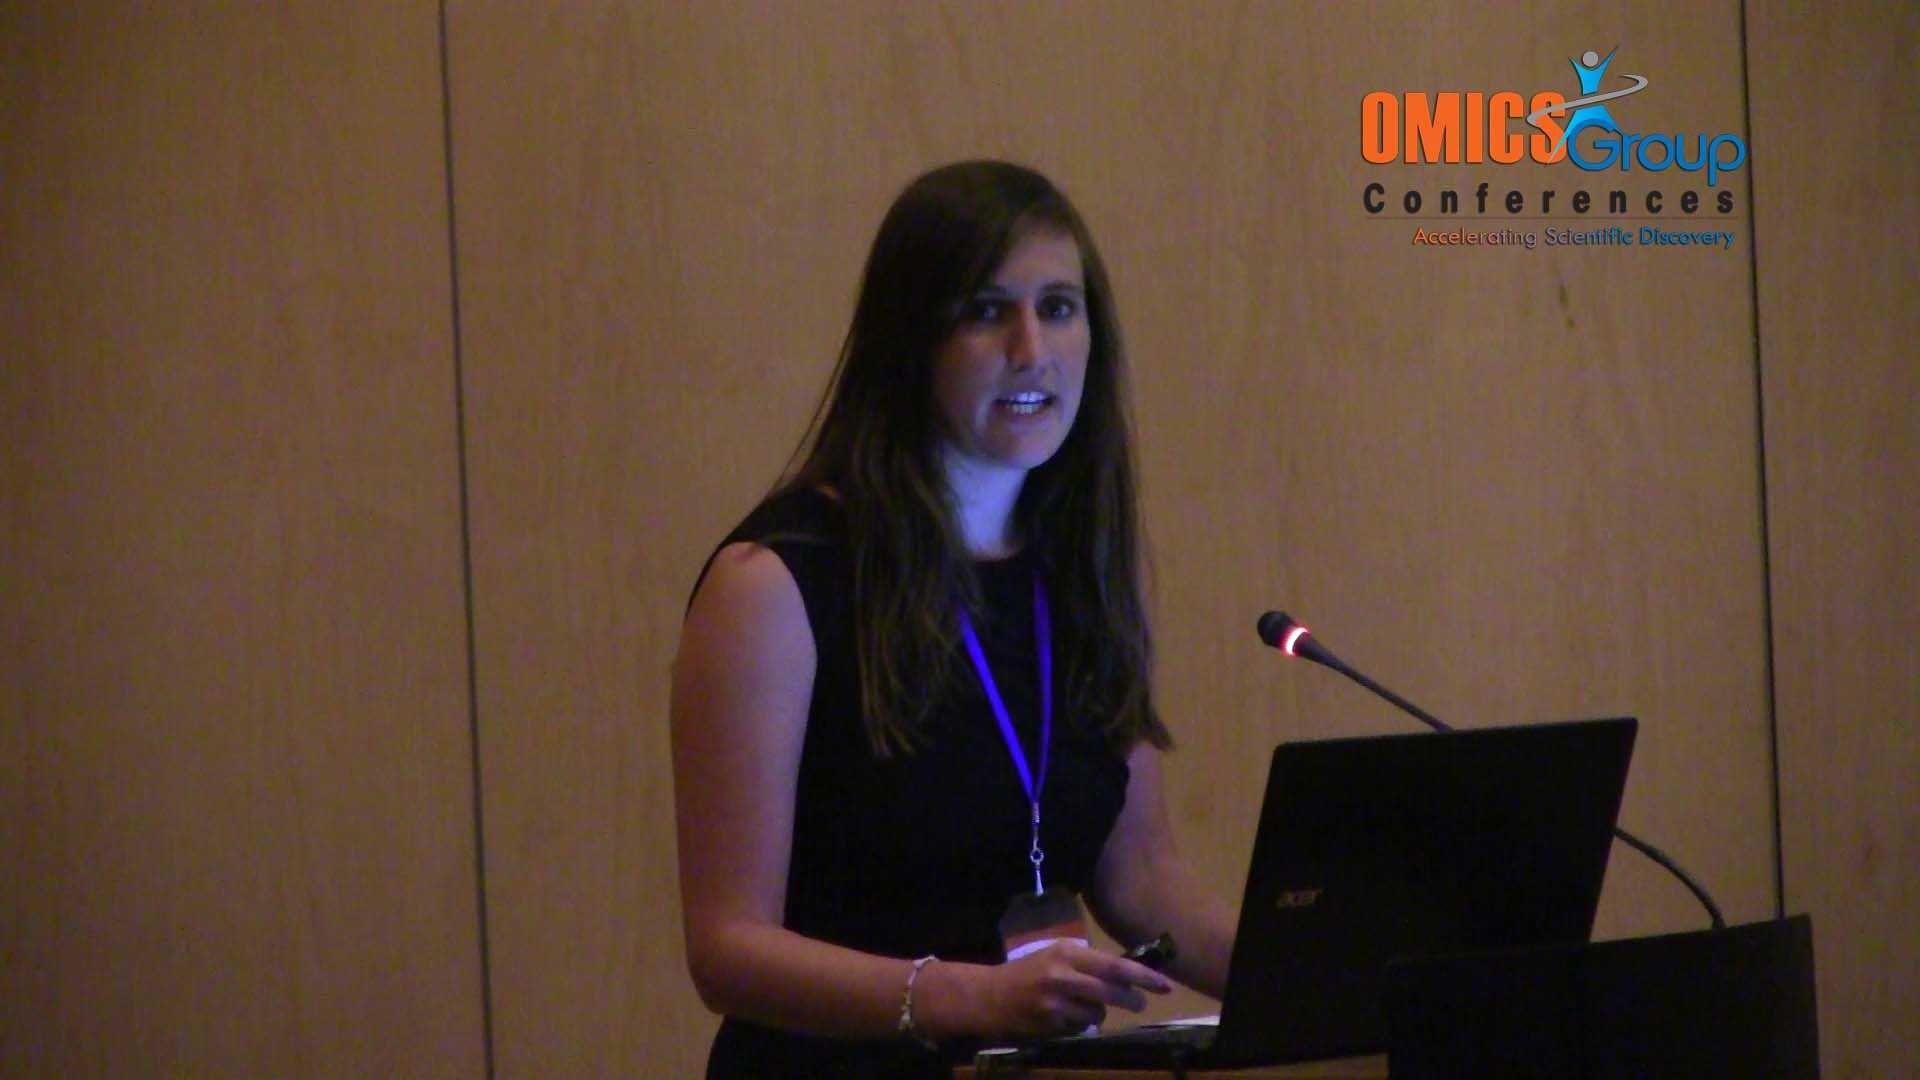 R J M van Knippenberg | OMICS International